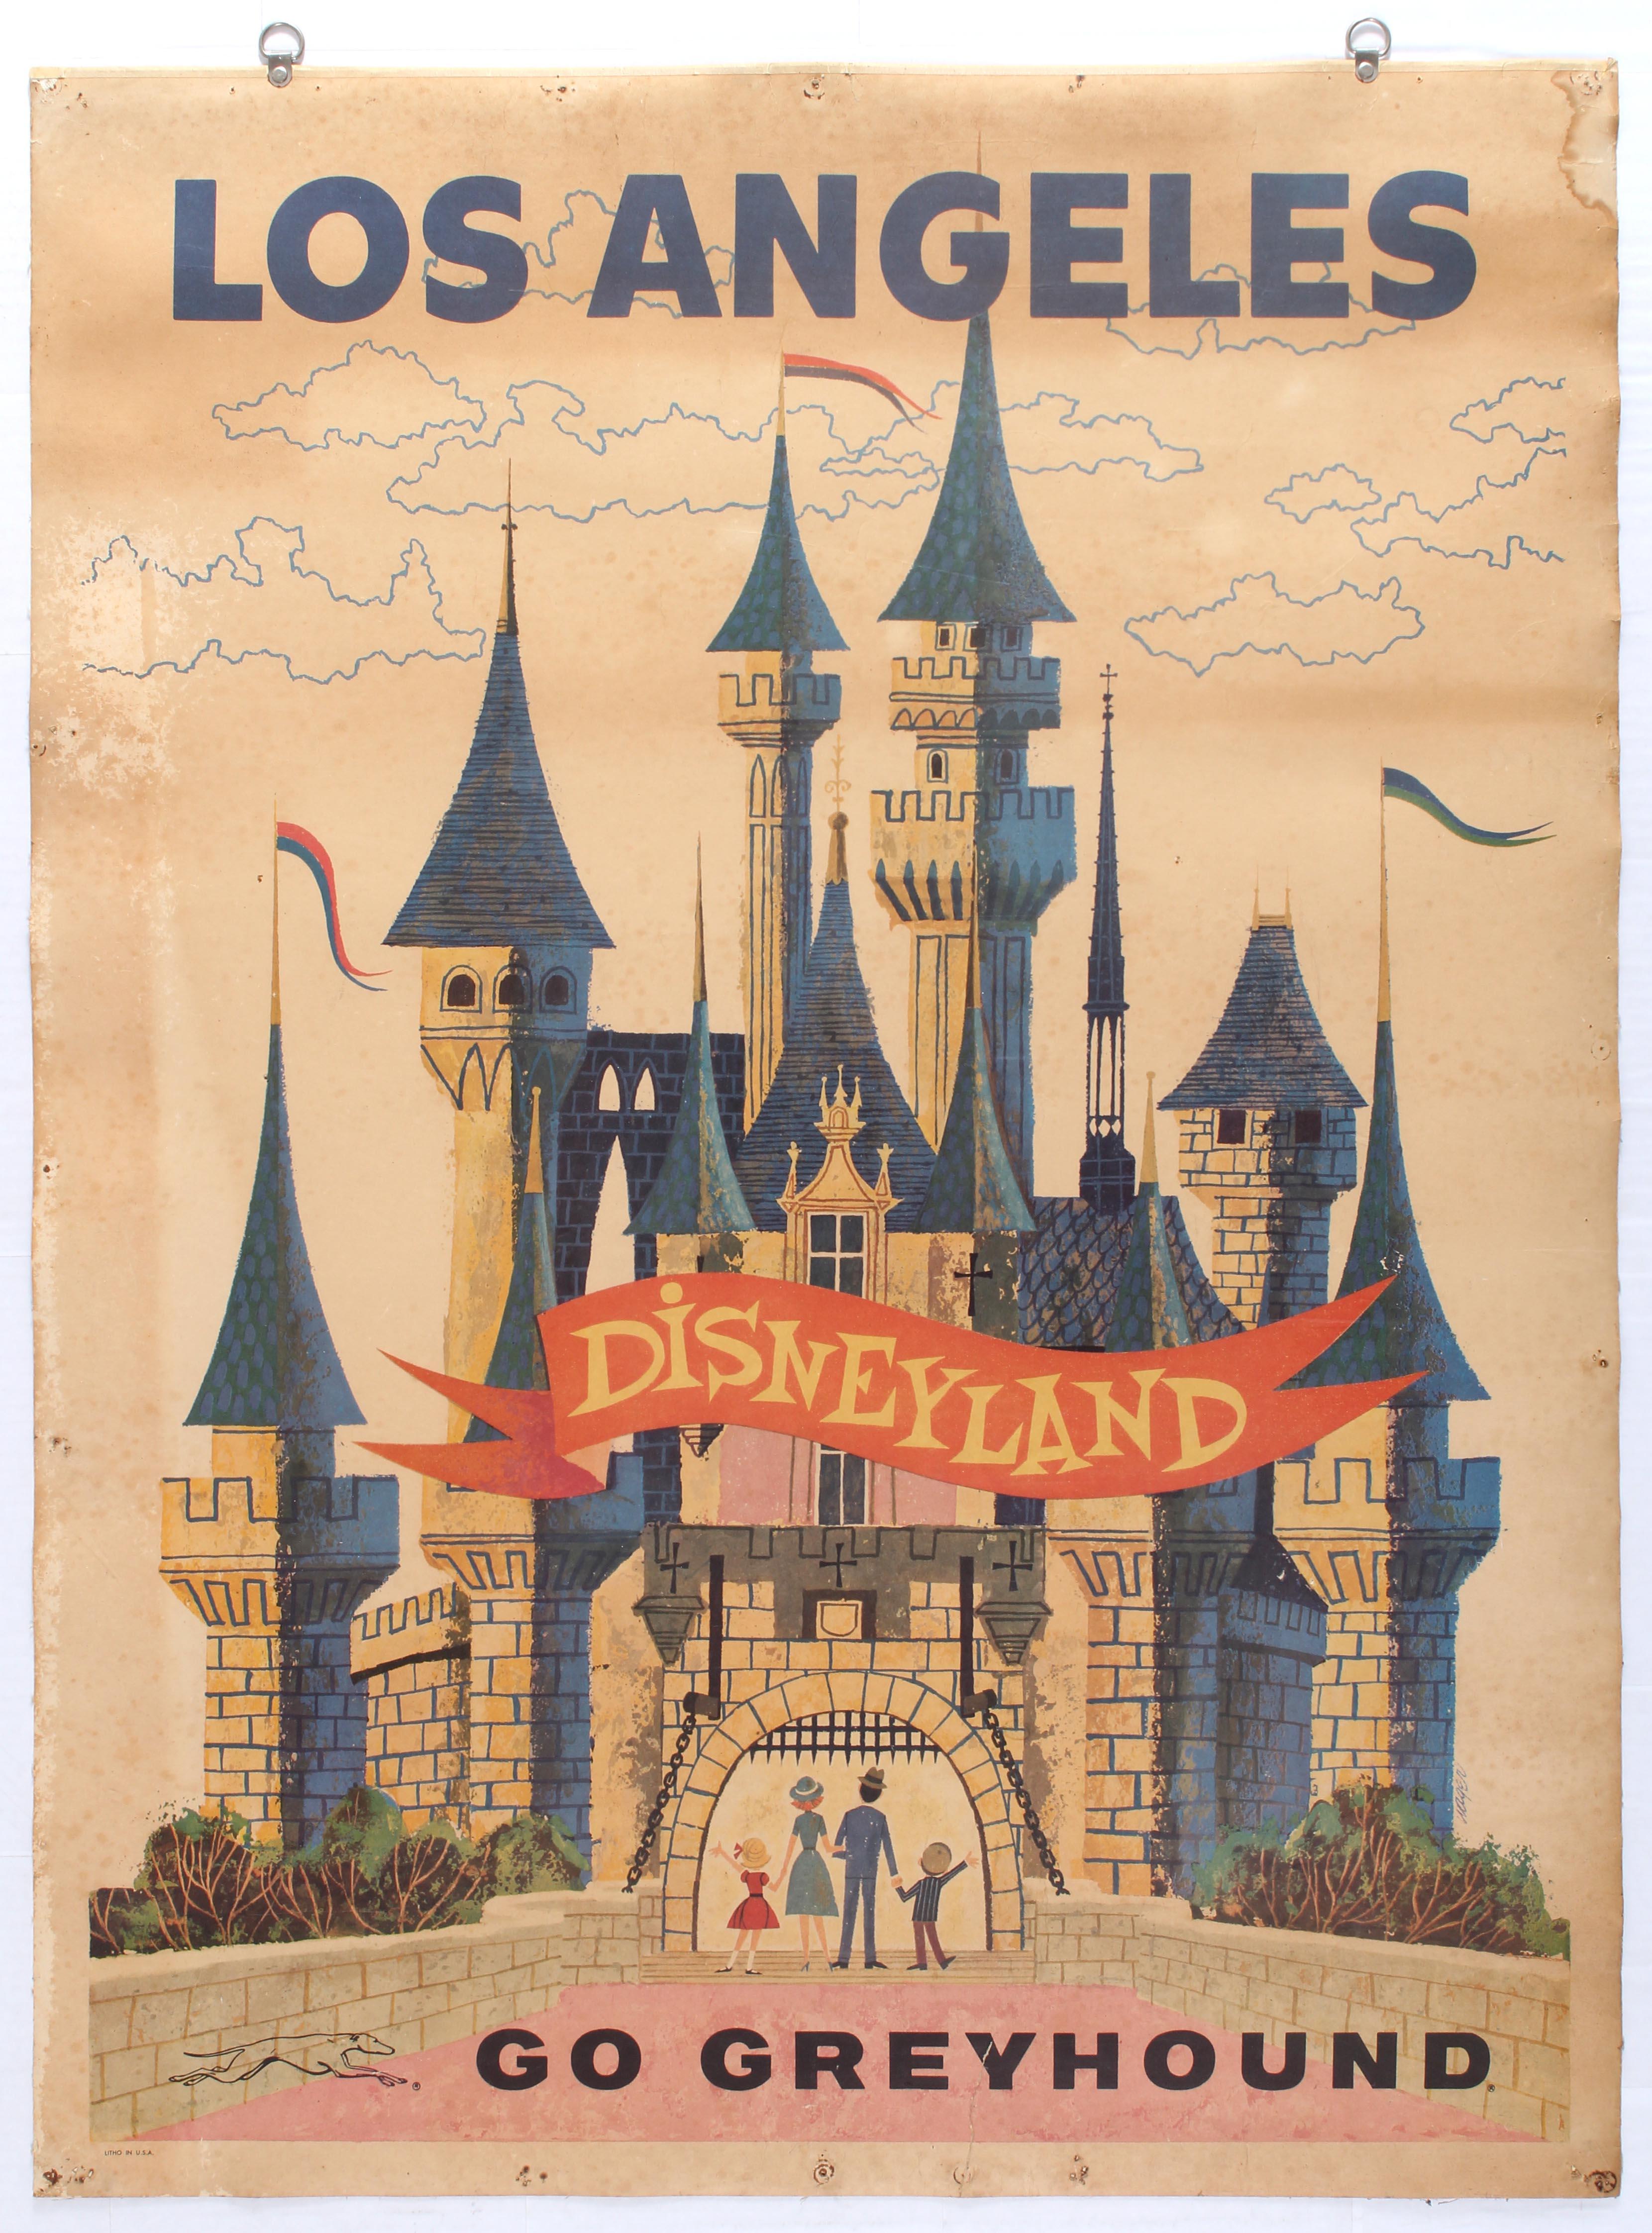 Lot 1504 - Advertising Poster Los Angeles Disneyland Greyhound